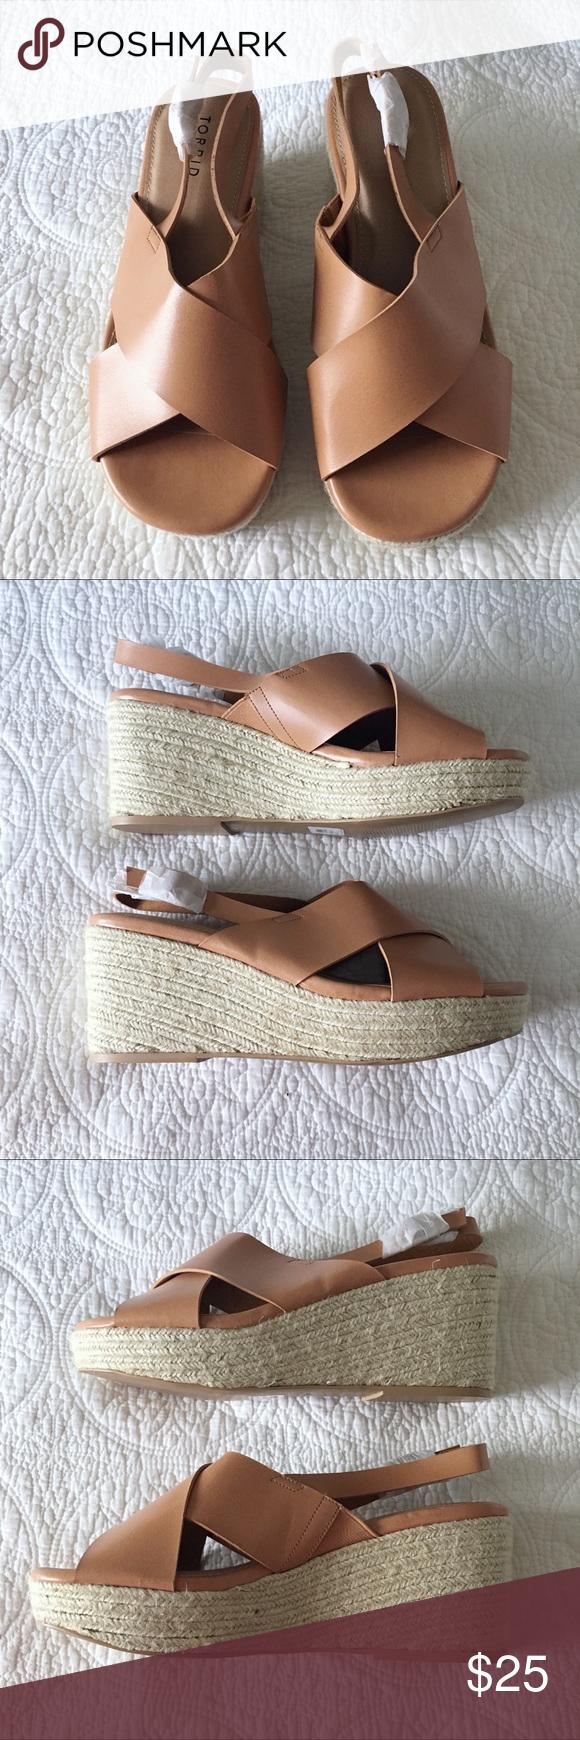 🚨LAST CHANCE! Torrid Wedge Sandals